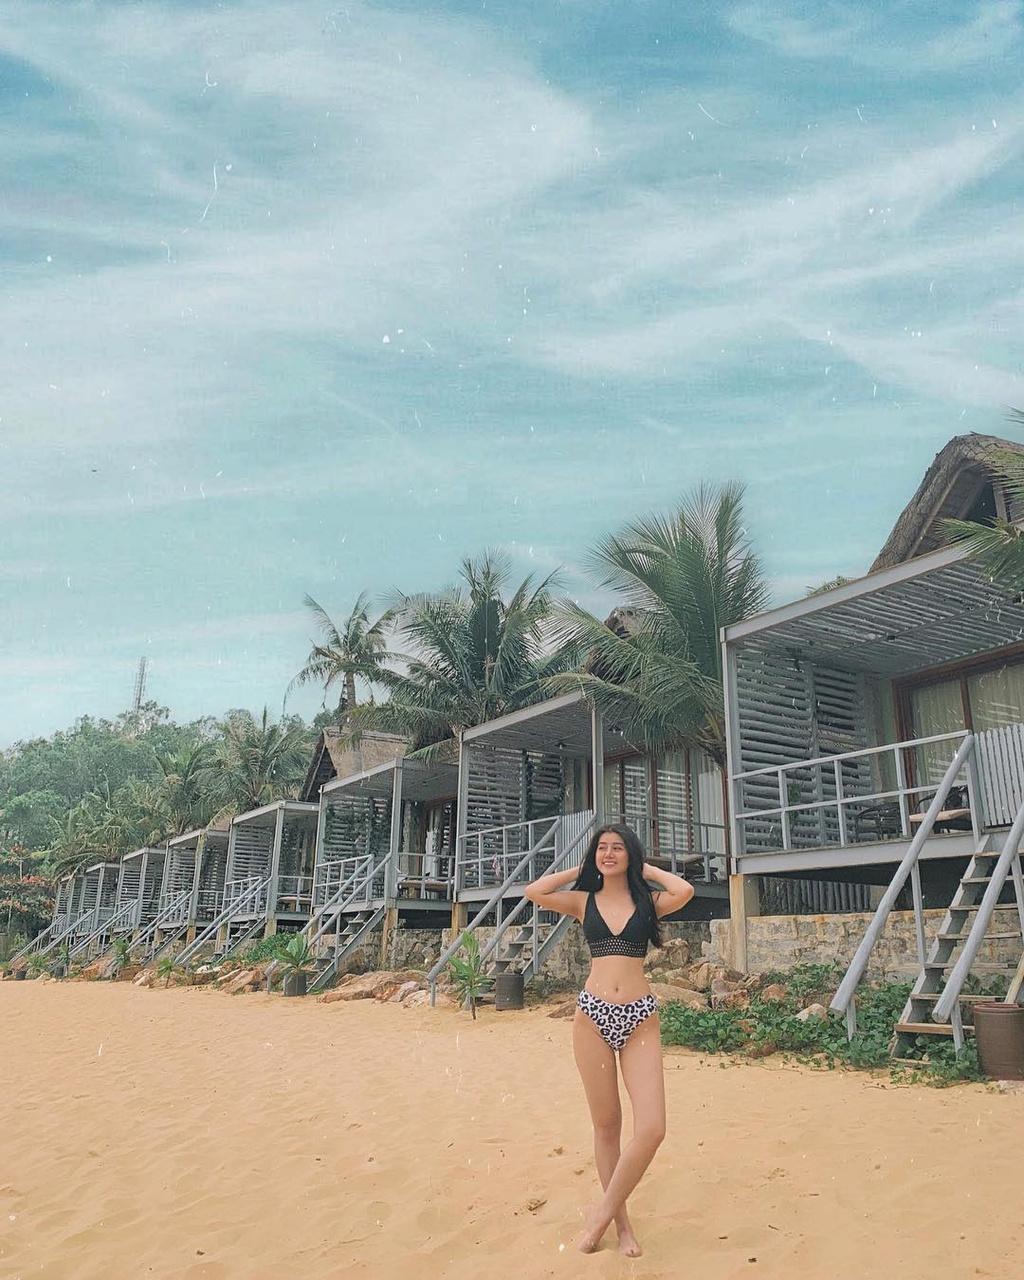 Don nang he Quy Nhon tai 4 resort sang chanh hinh anh 7 thuyoanh0909.jpg